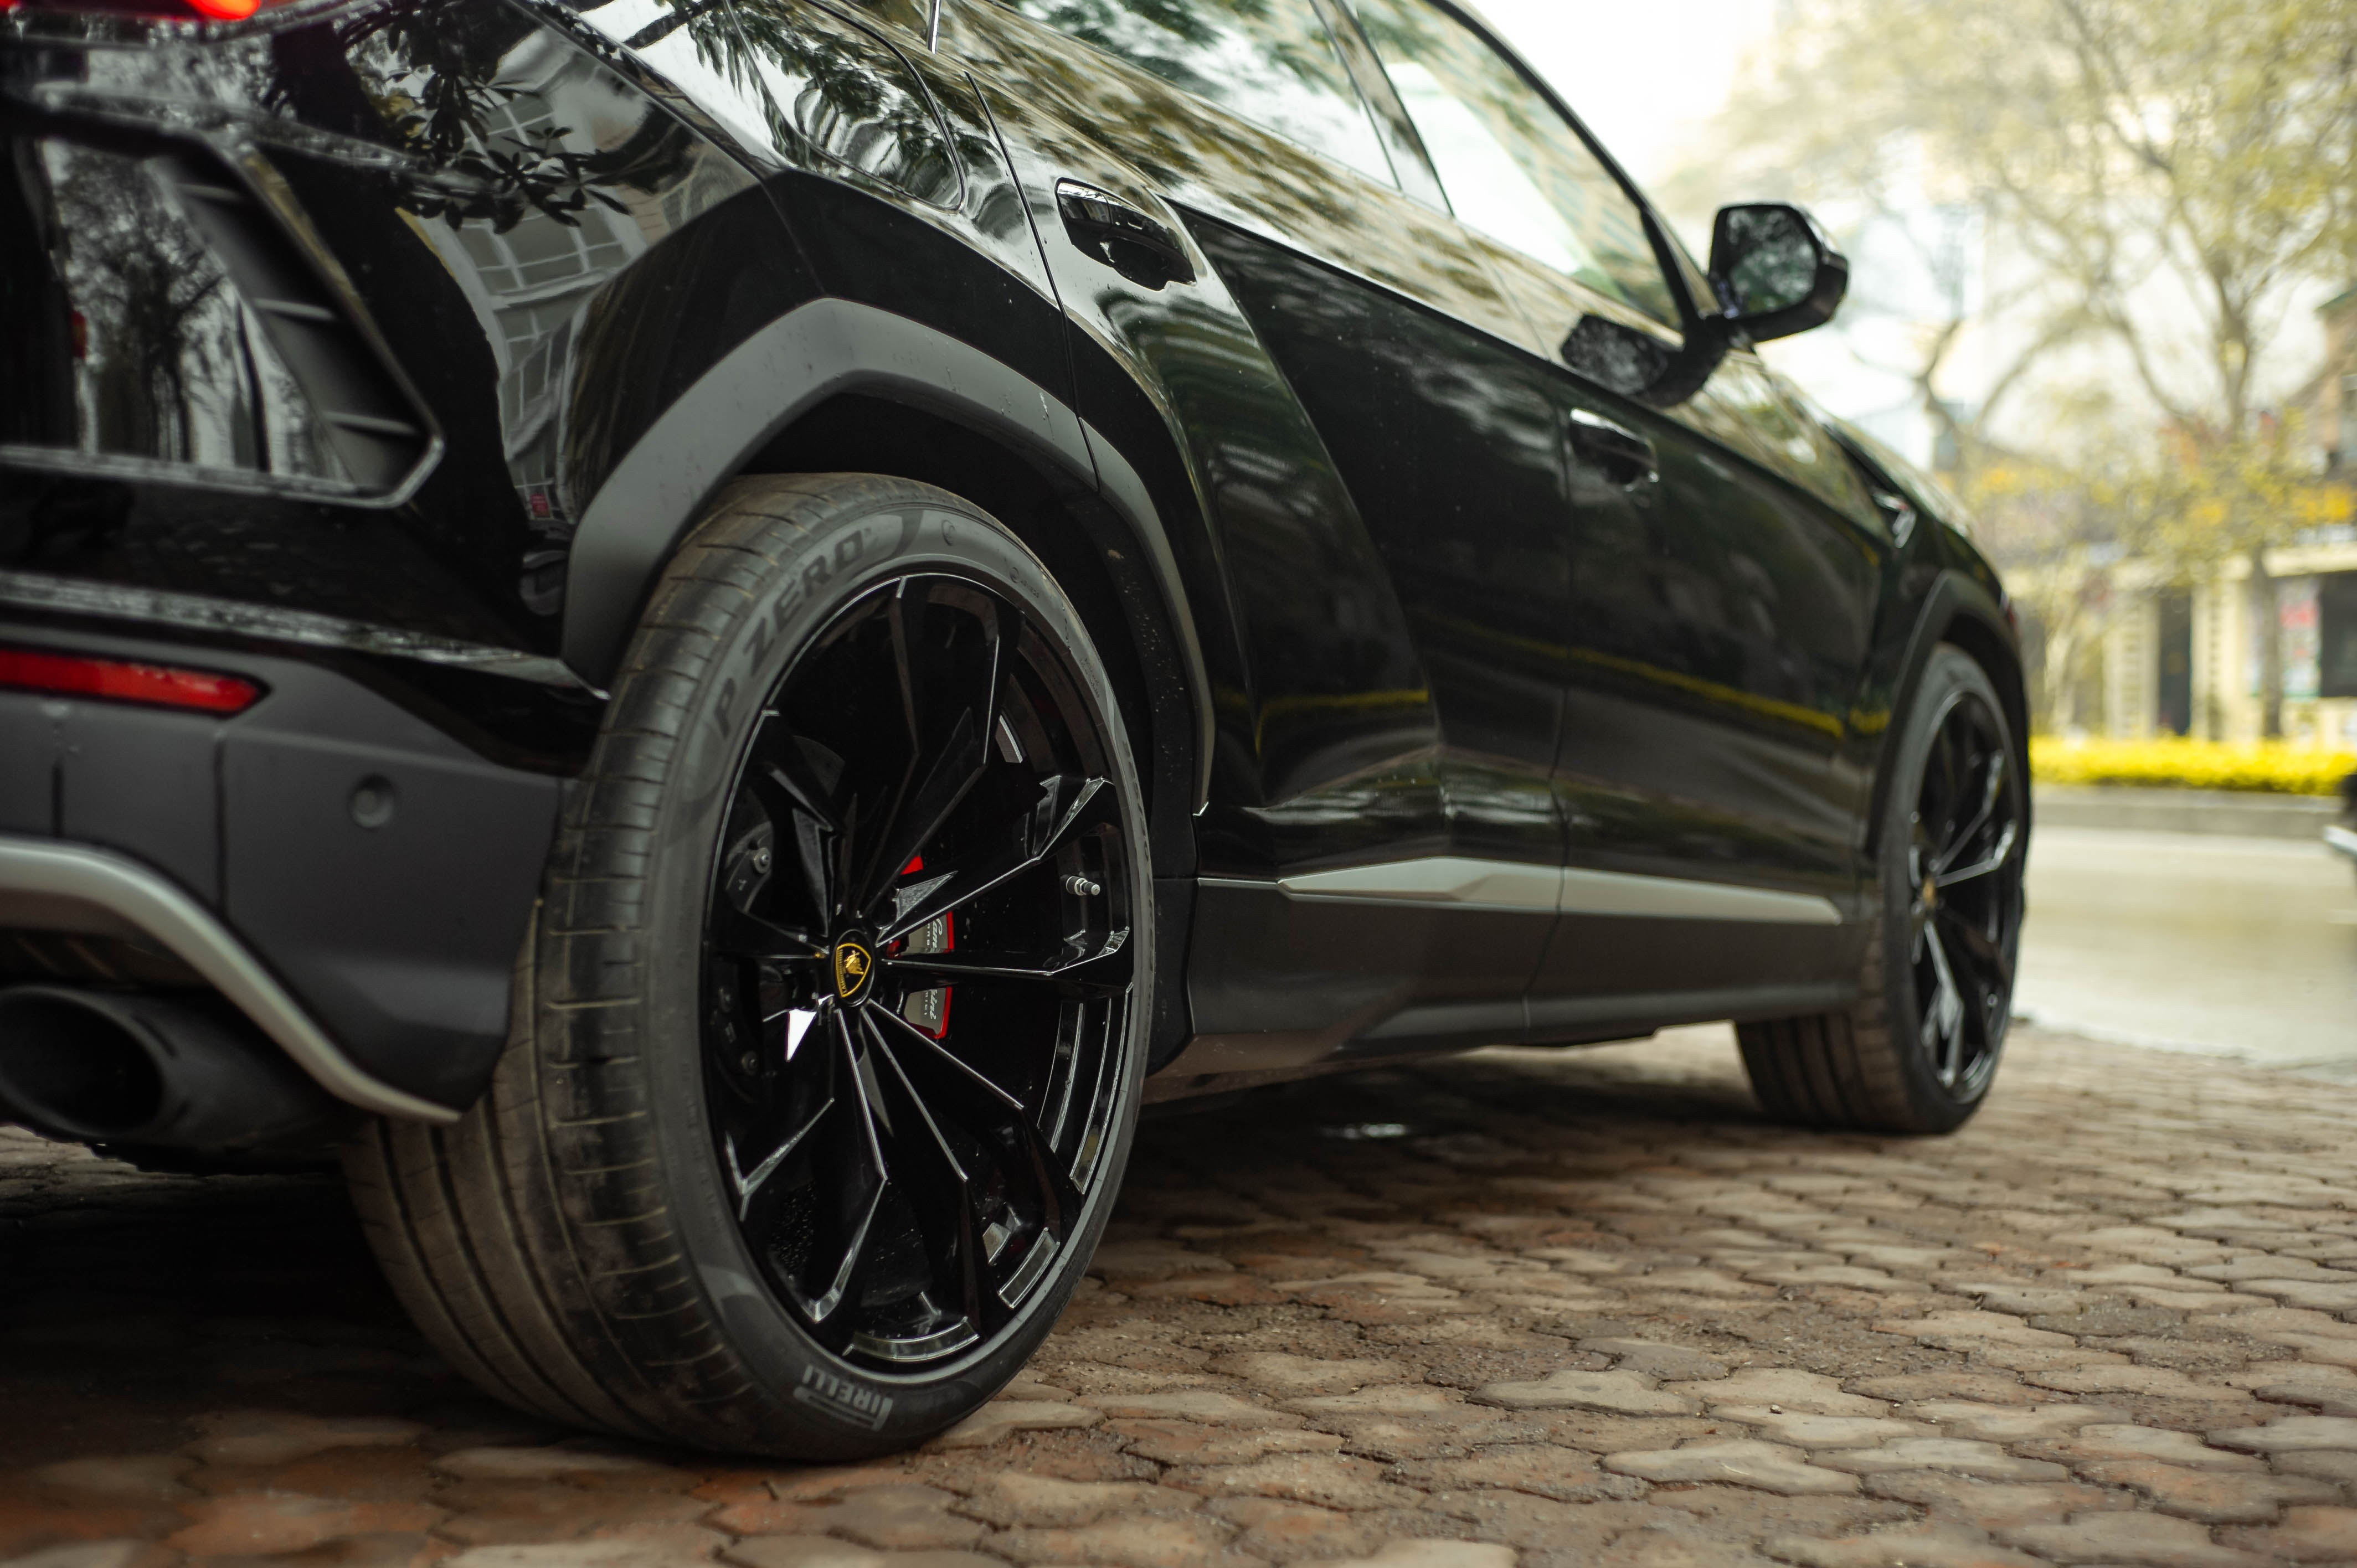 Ngam Lamborghini Urus mau den dau tien ve VN, gia khoang 1 trieu USD hinh anh 6 Urus_zing_58_.jpg